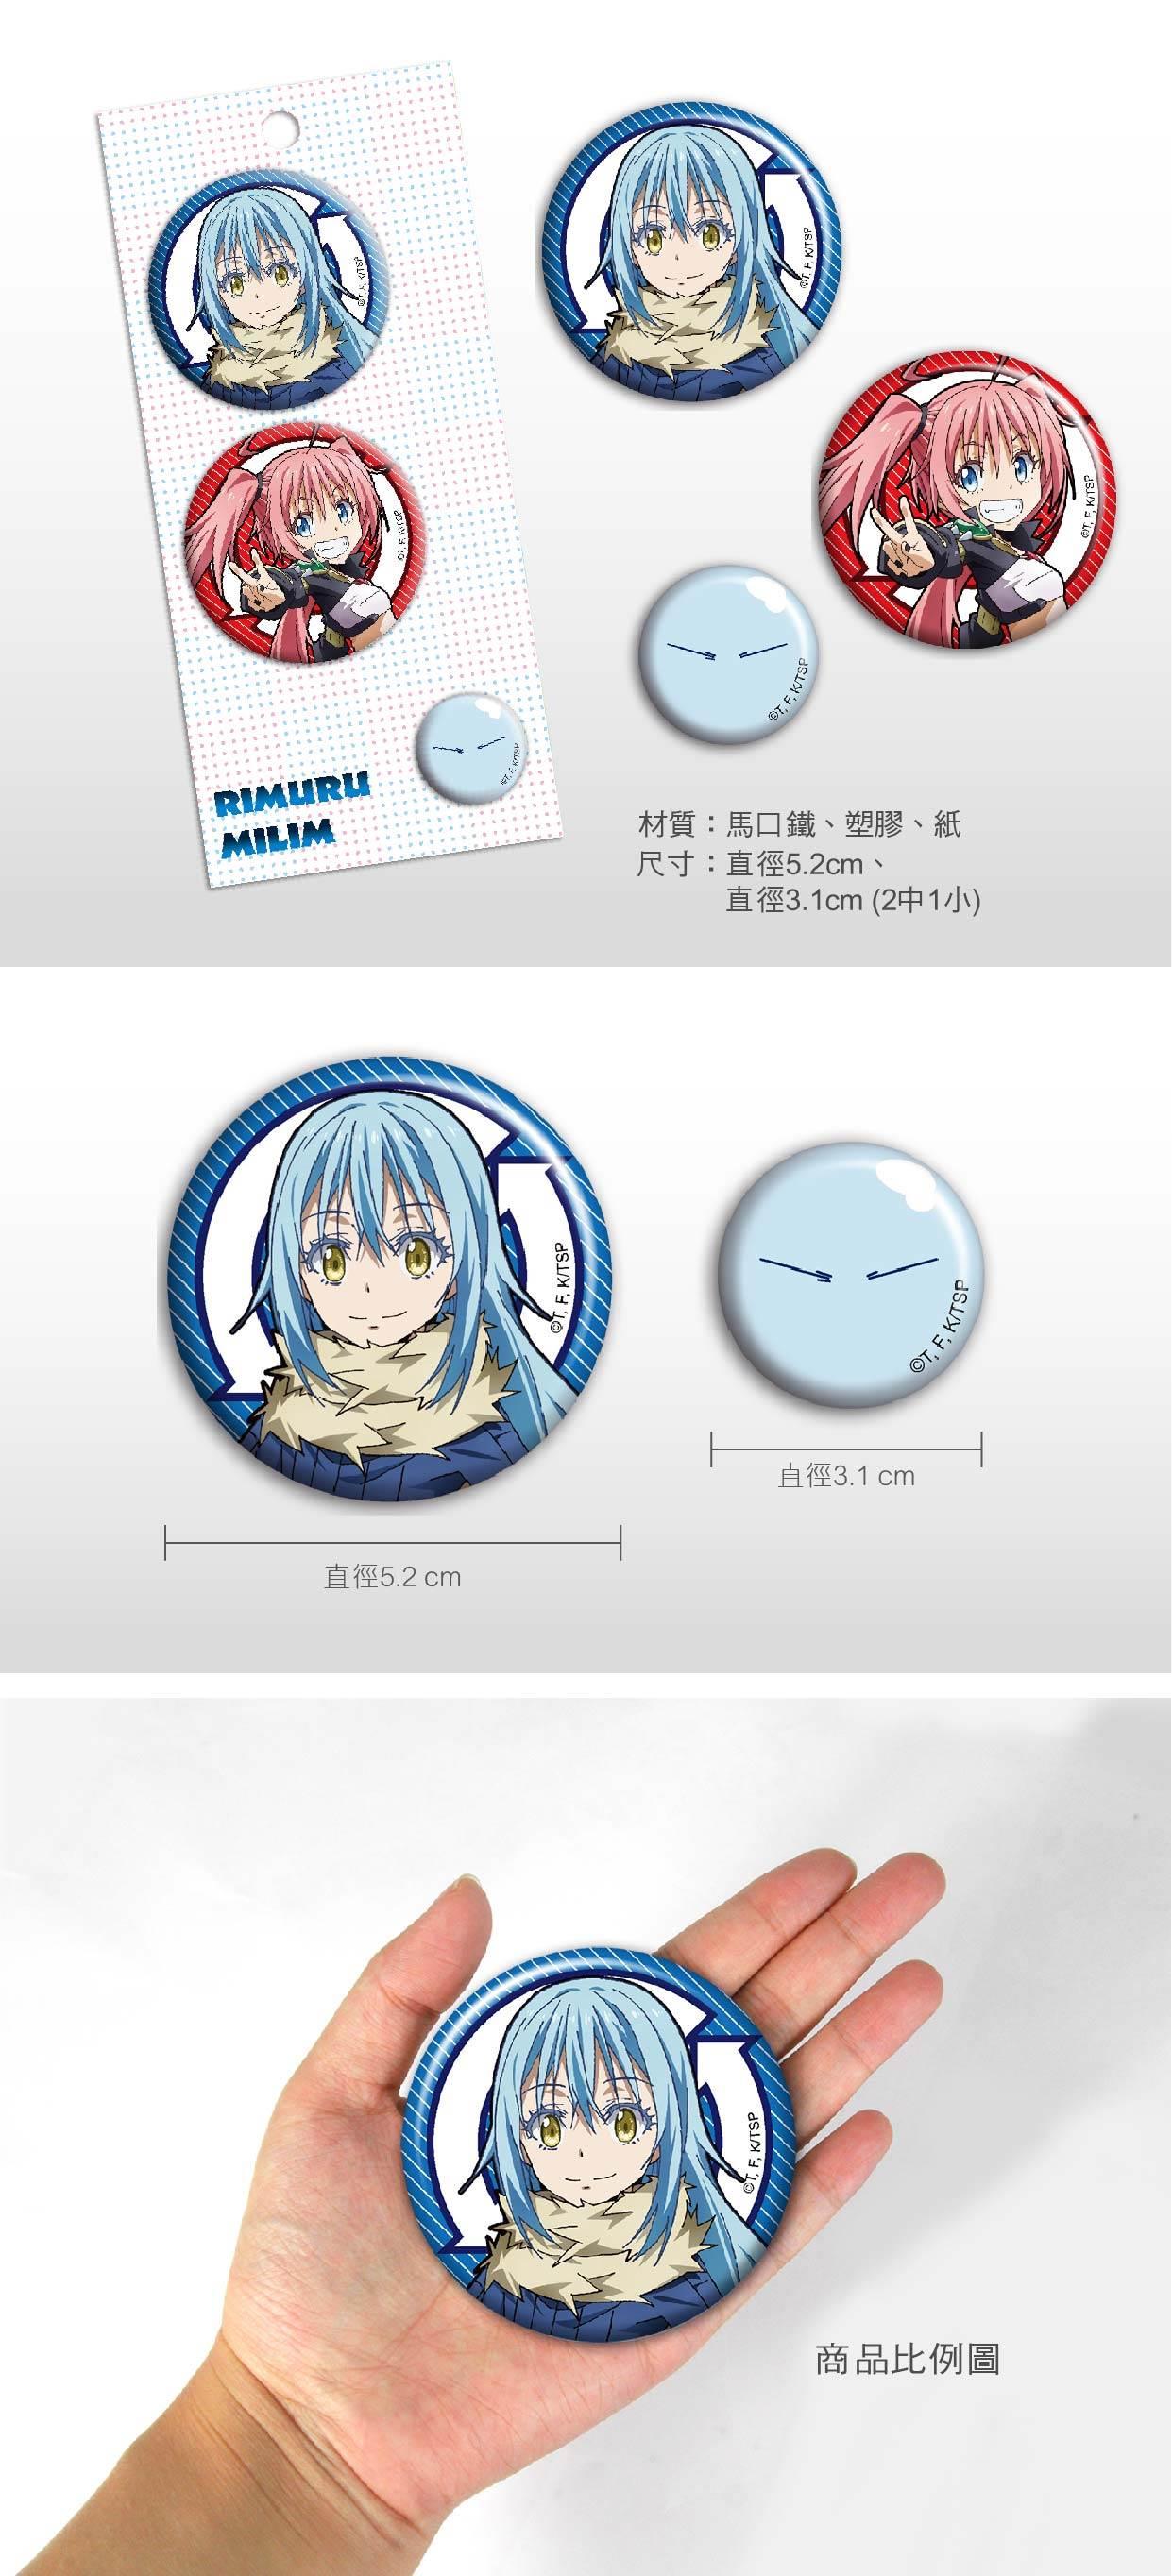 http://products.fukang.com.tw/4712926871652.jpg